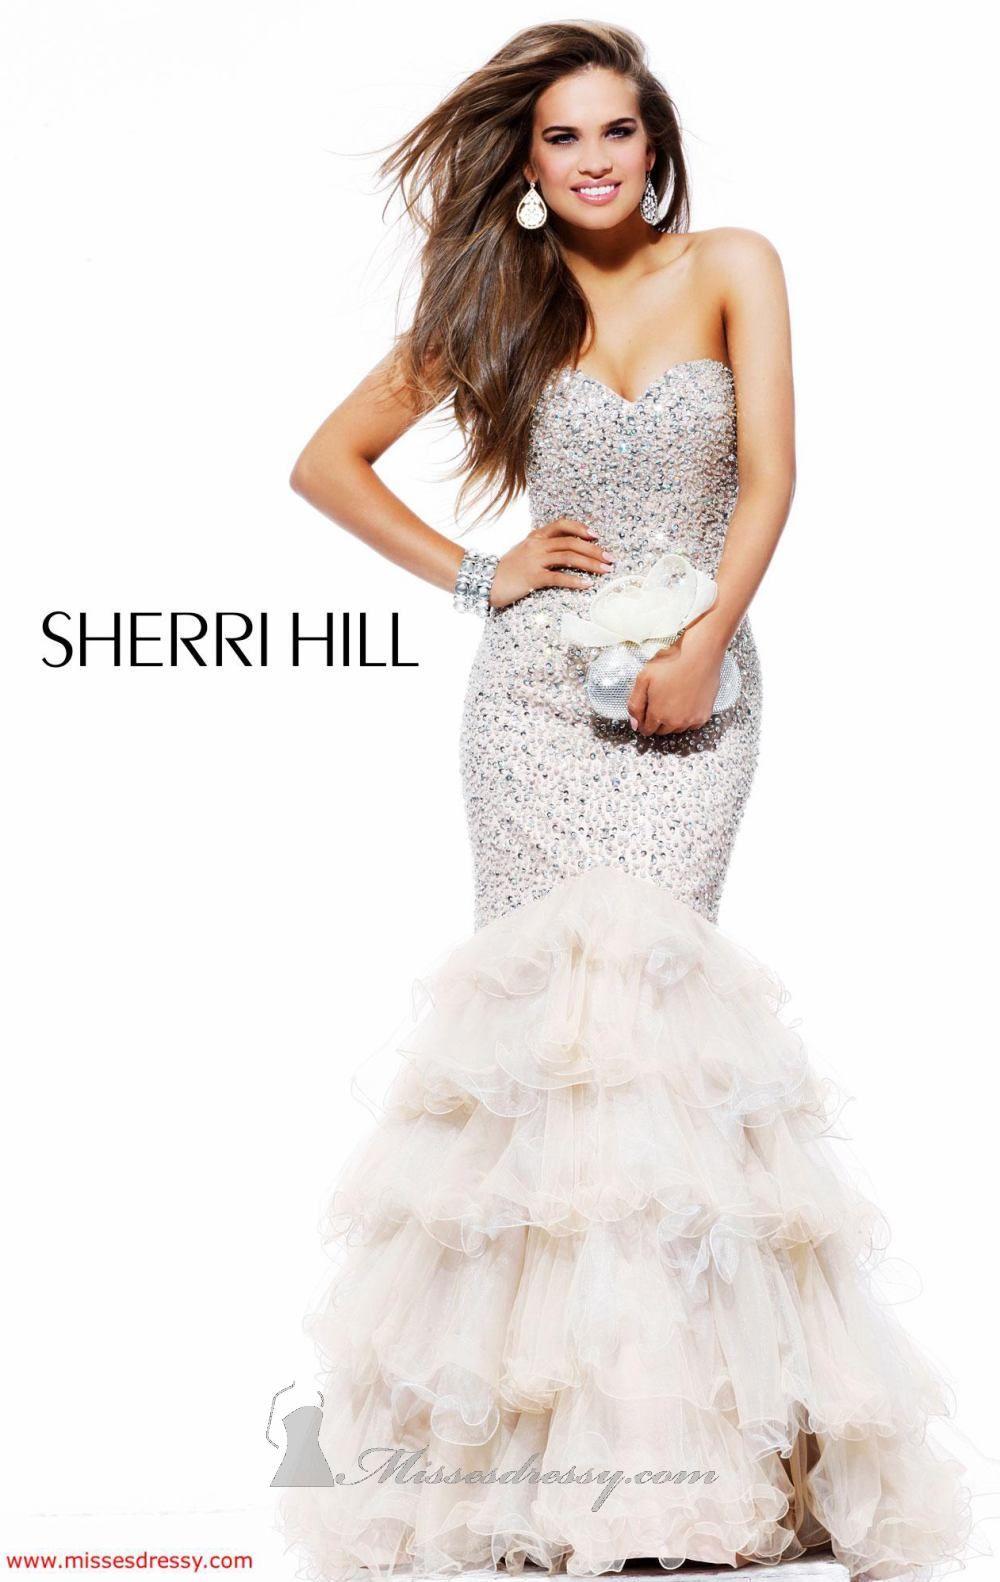 Sherri hill classic pinterest aqua nude and prom